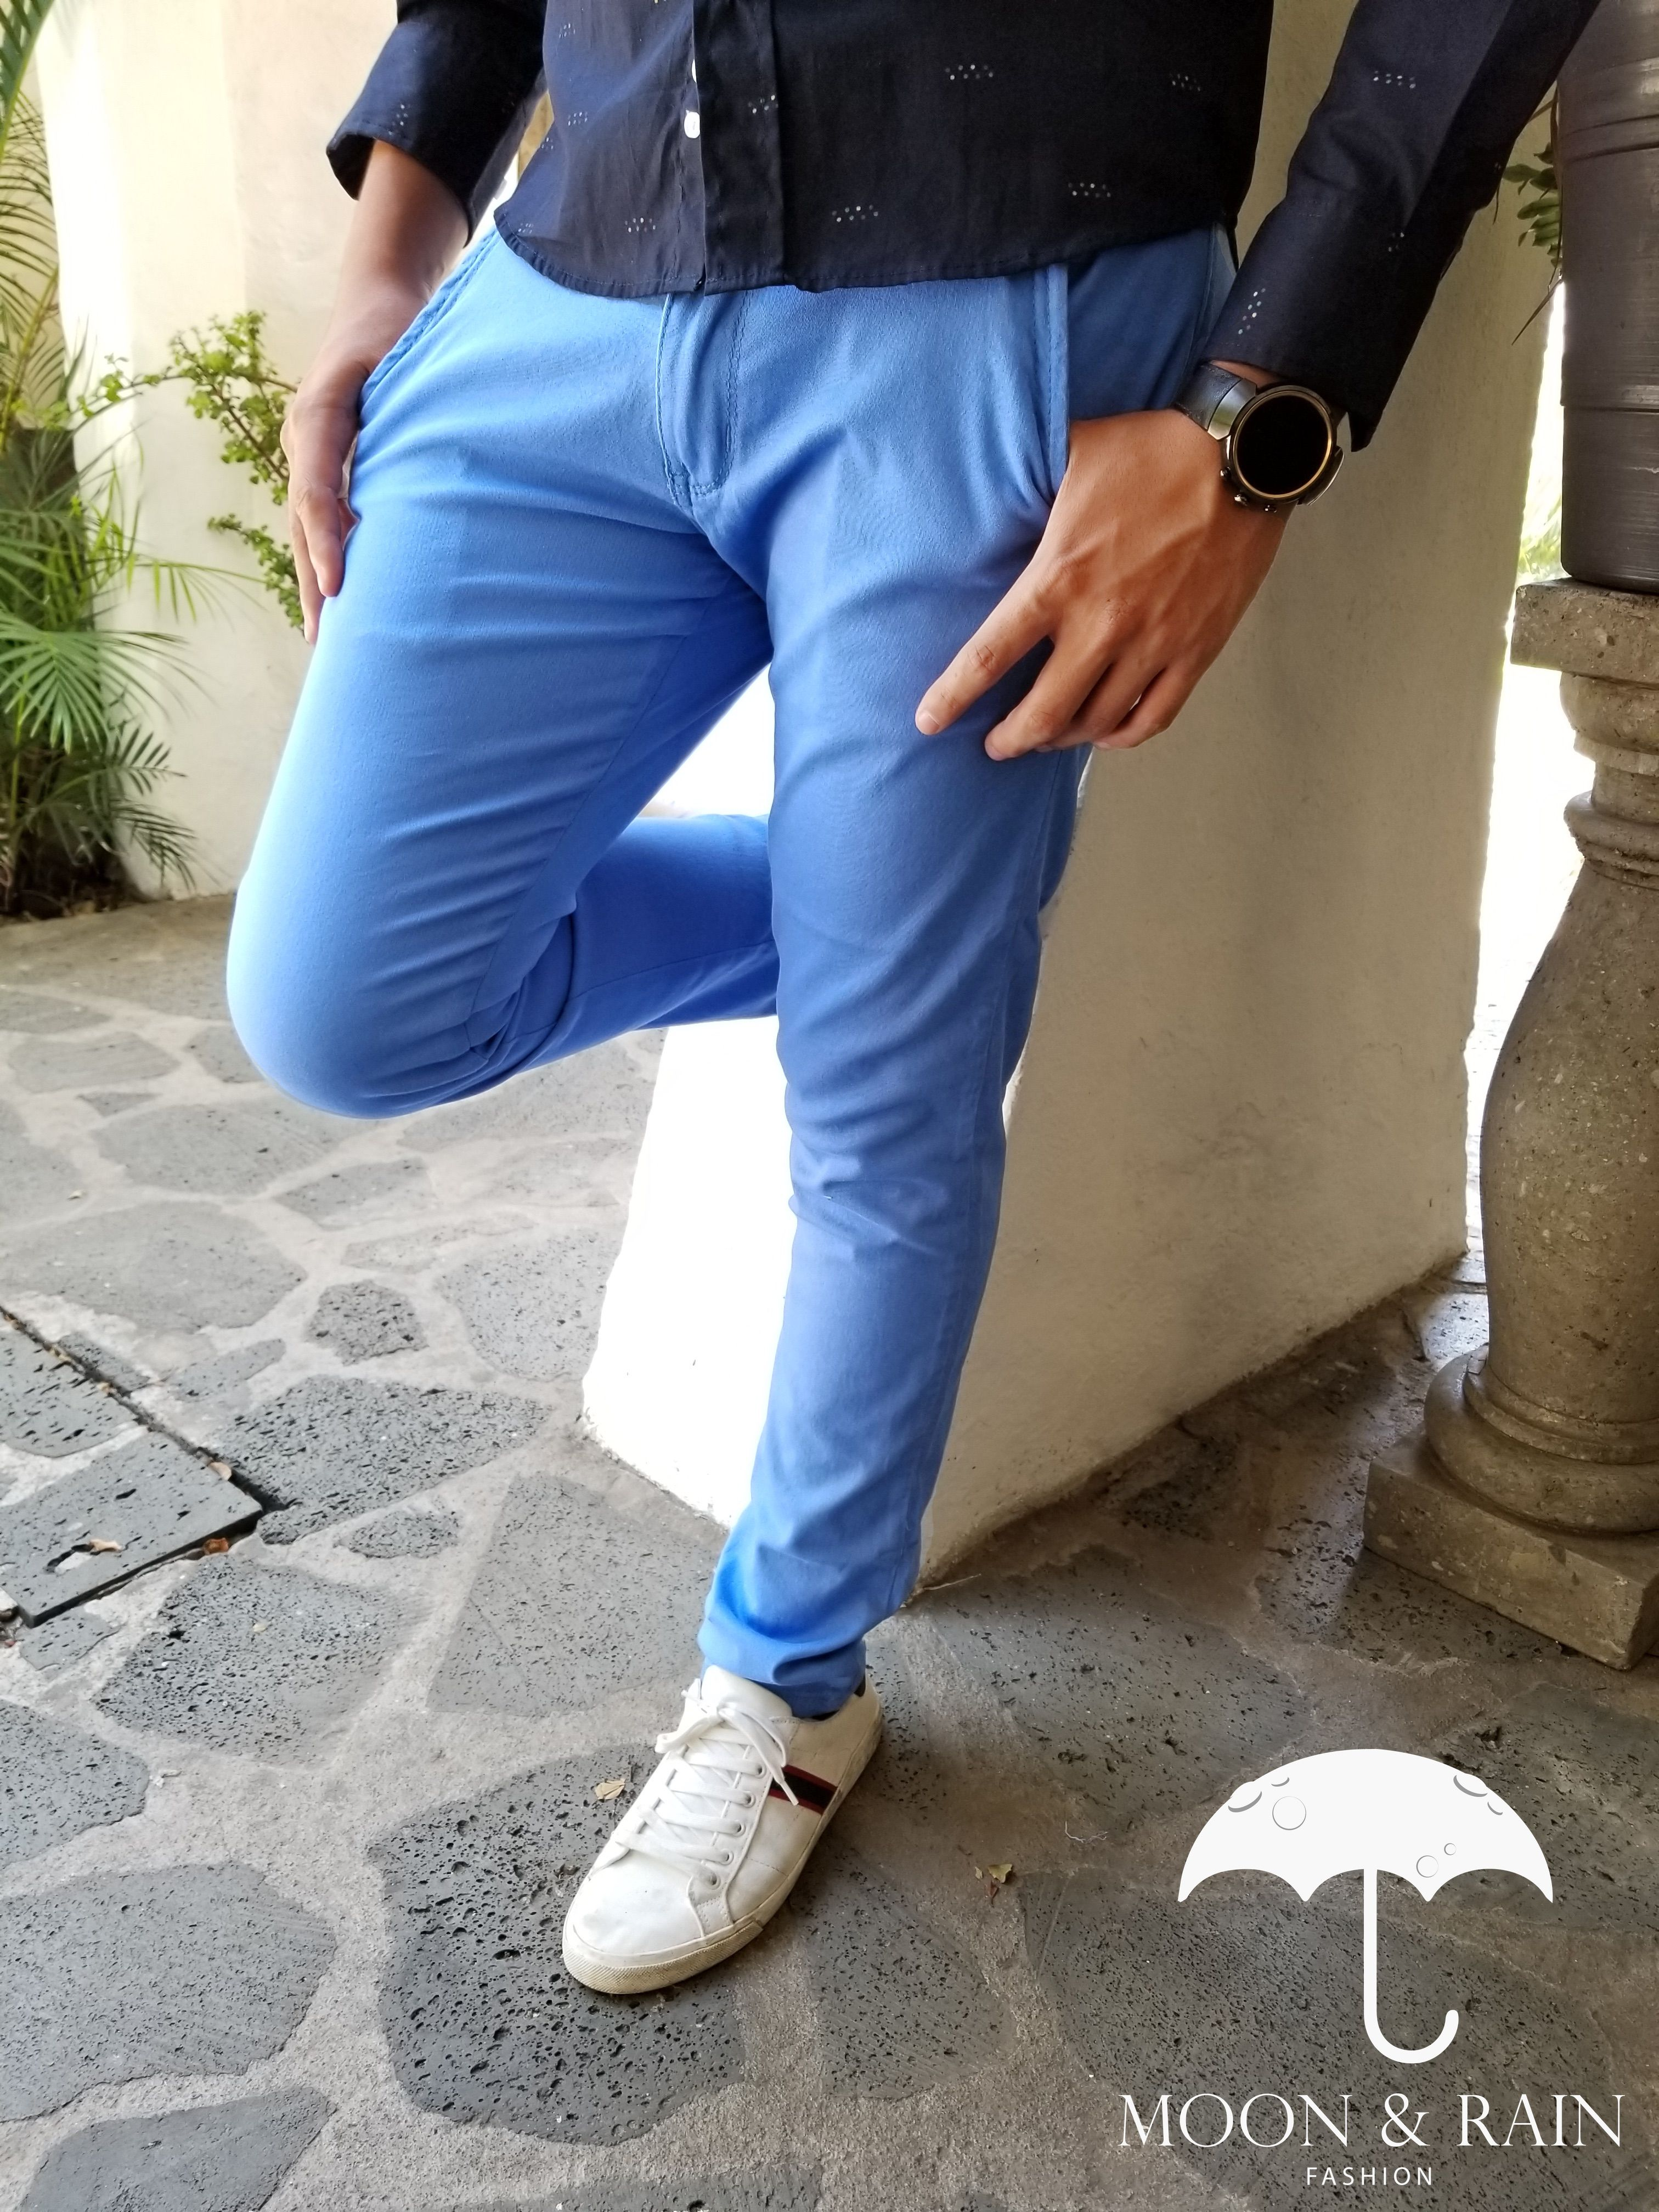 Outfit Para Hombre Pantalon Skinny De Gabardina Azul Cielo Tenis Blancos Disenos De La Marca Moon Rain Pantalon Azul Hombre Ropa De Hombre Pantalon Azul